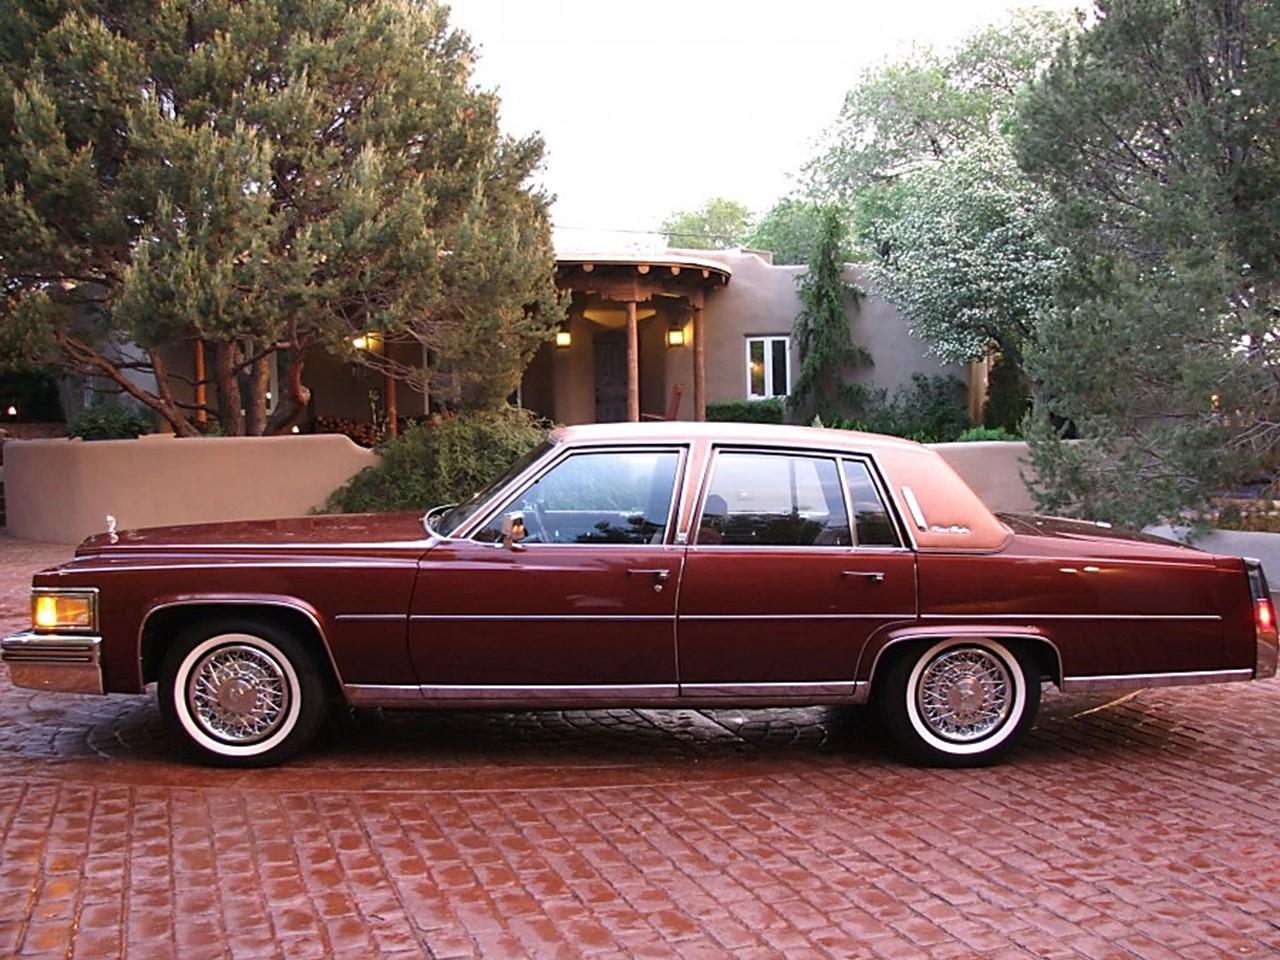 1979 Cadillac Fleetwood Brougham Sedan - Esoteric Doctrine ...